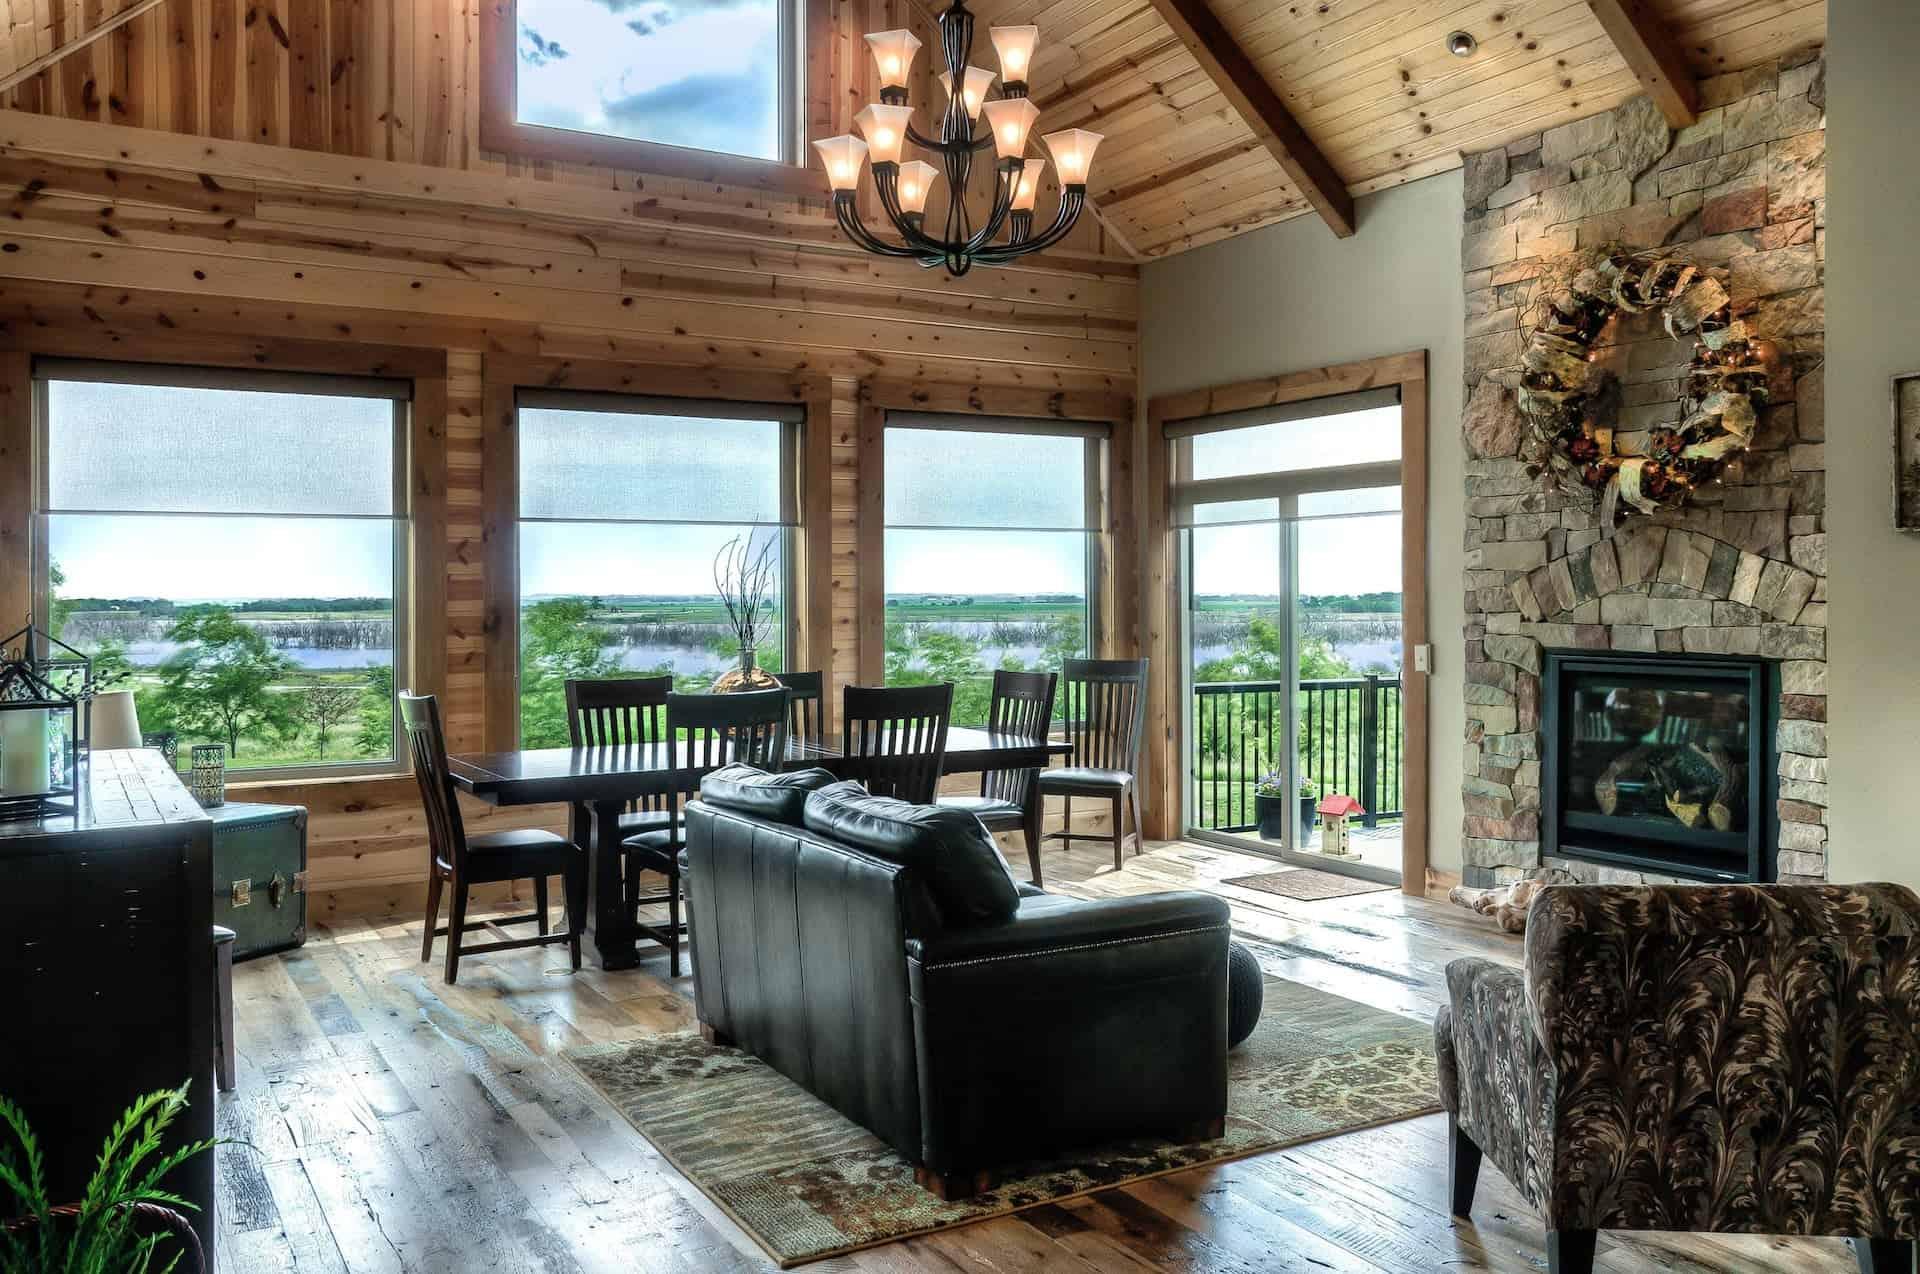 Image of luxury cabin in Omaha, Nebraska